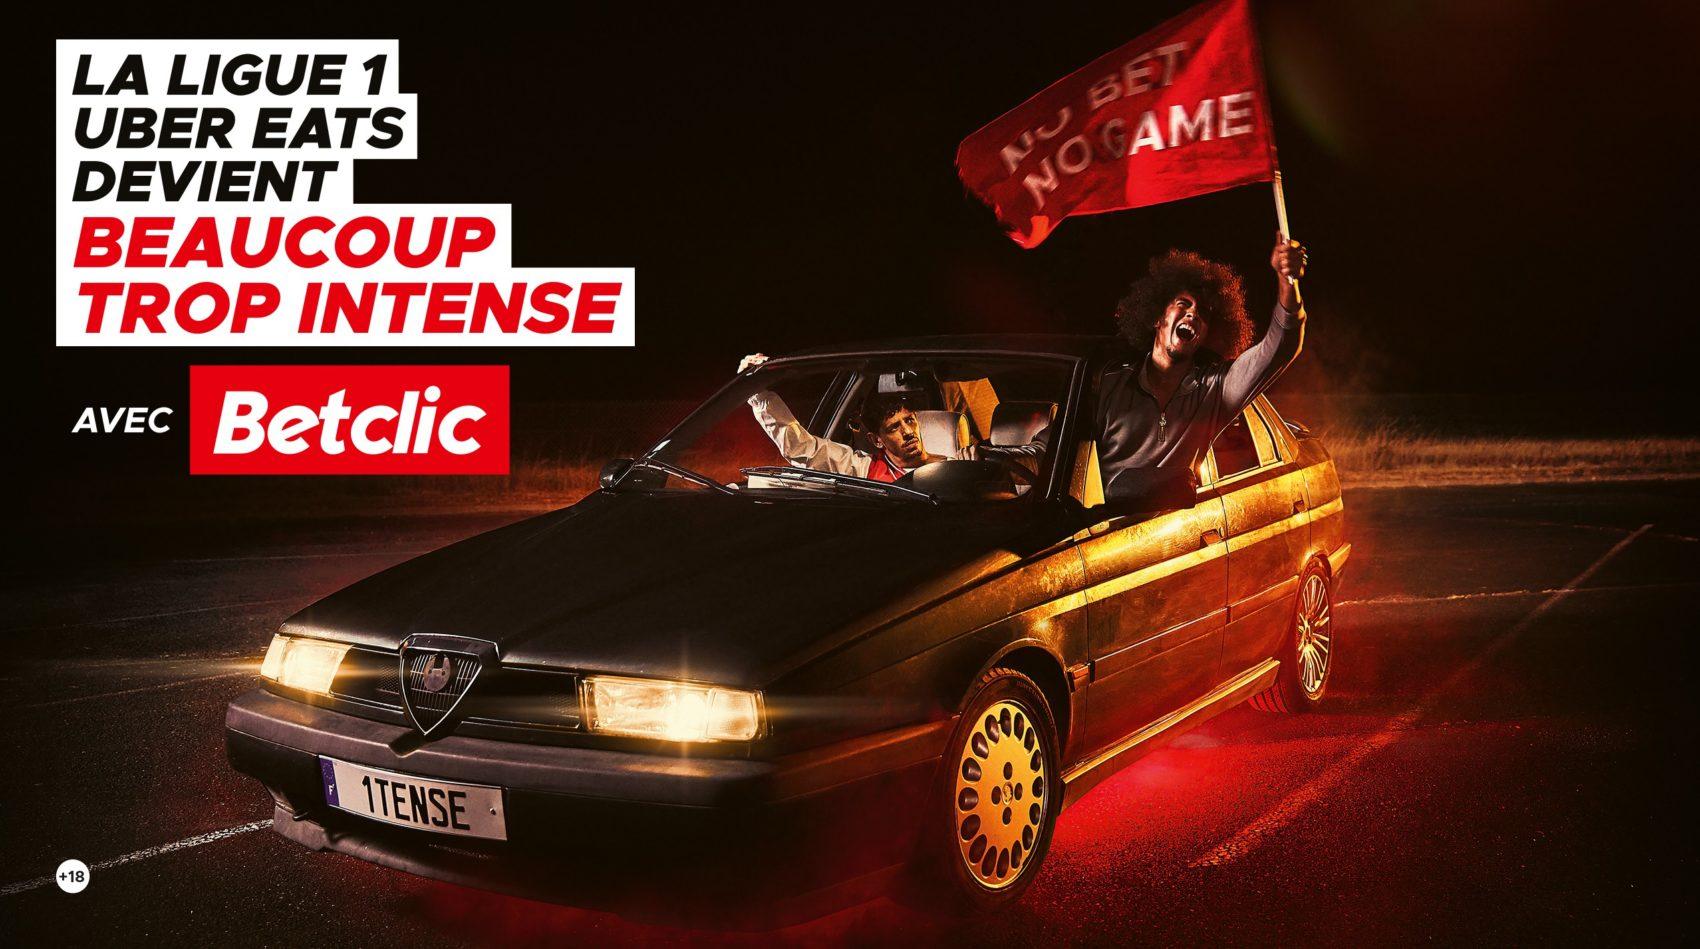 BETCLIC2008_affiche_Car__beaucoup_trop_intense_lafourmi_2544x1420